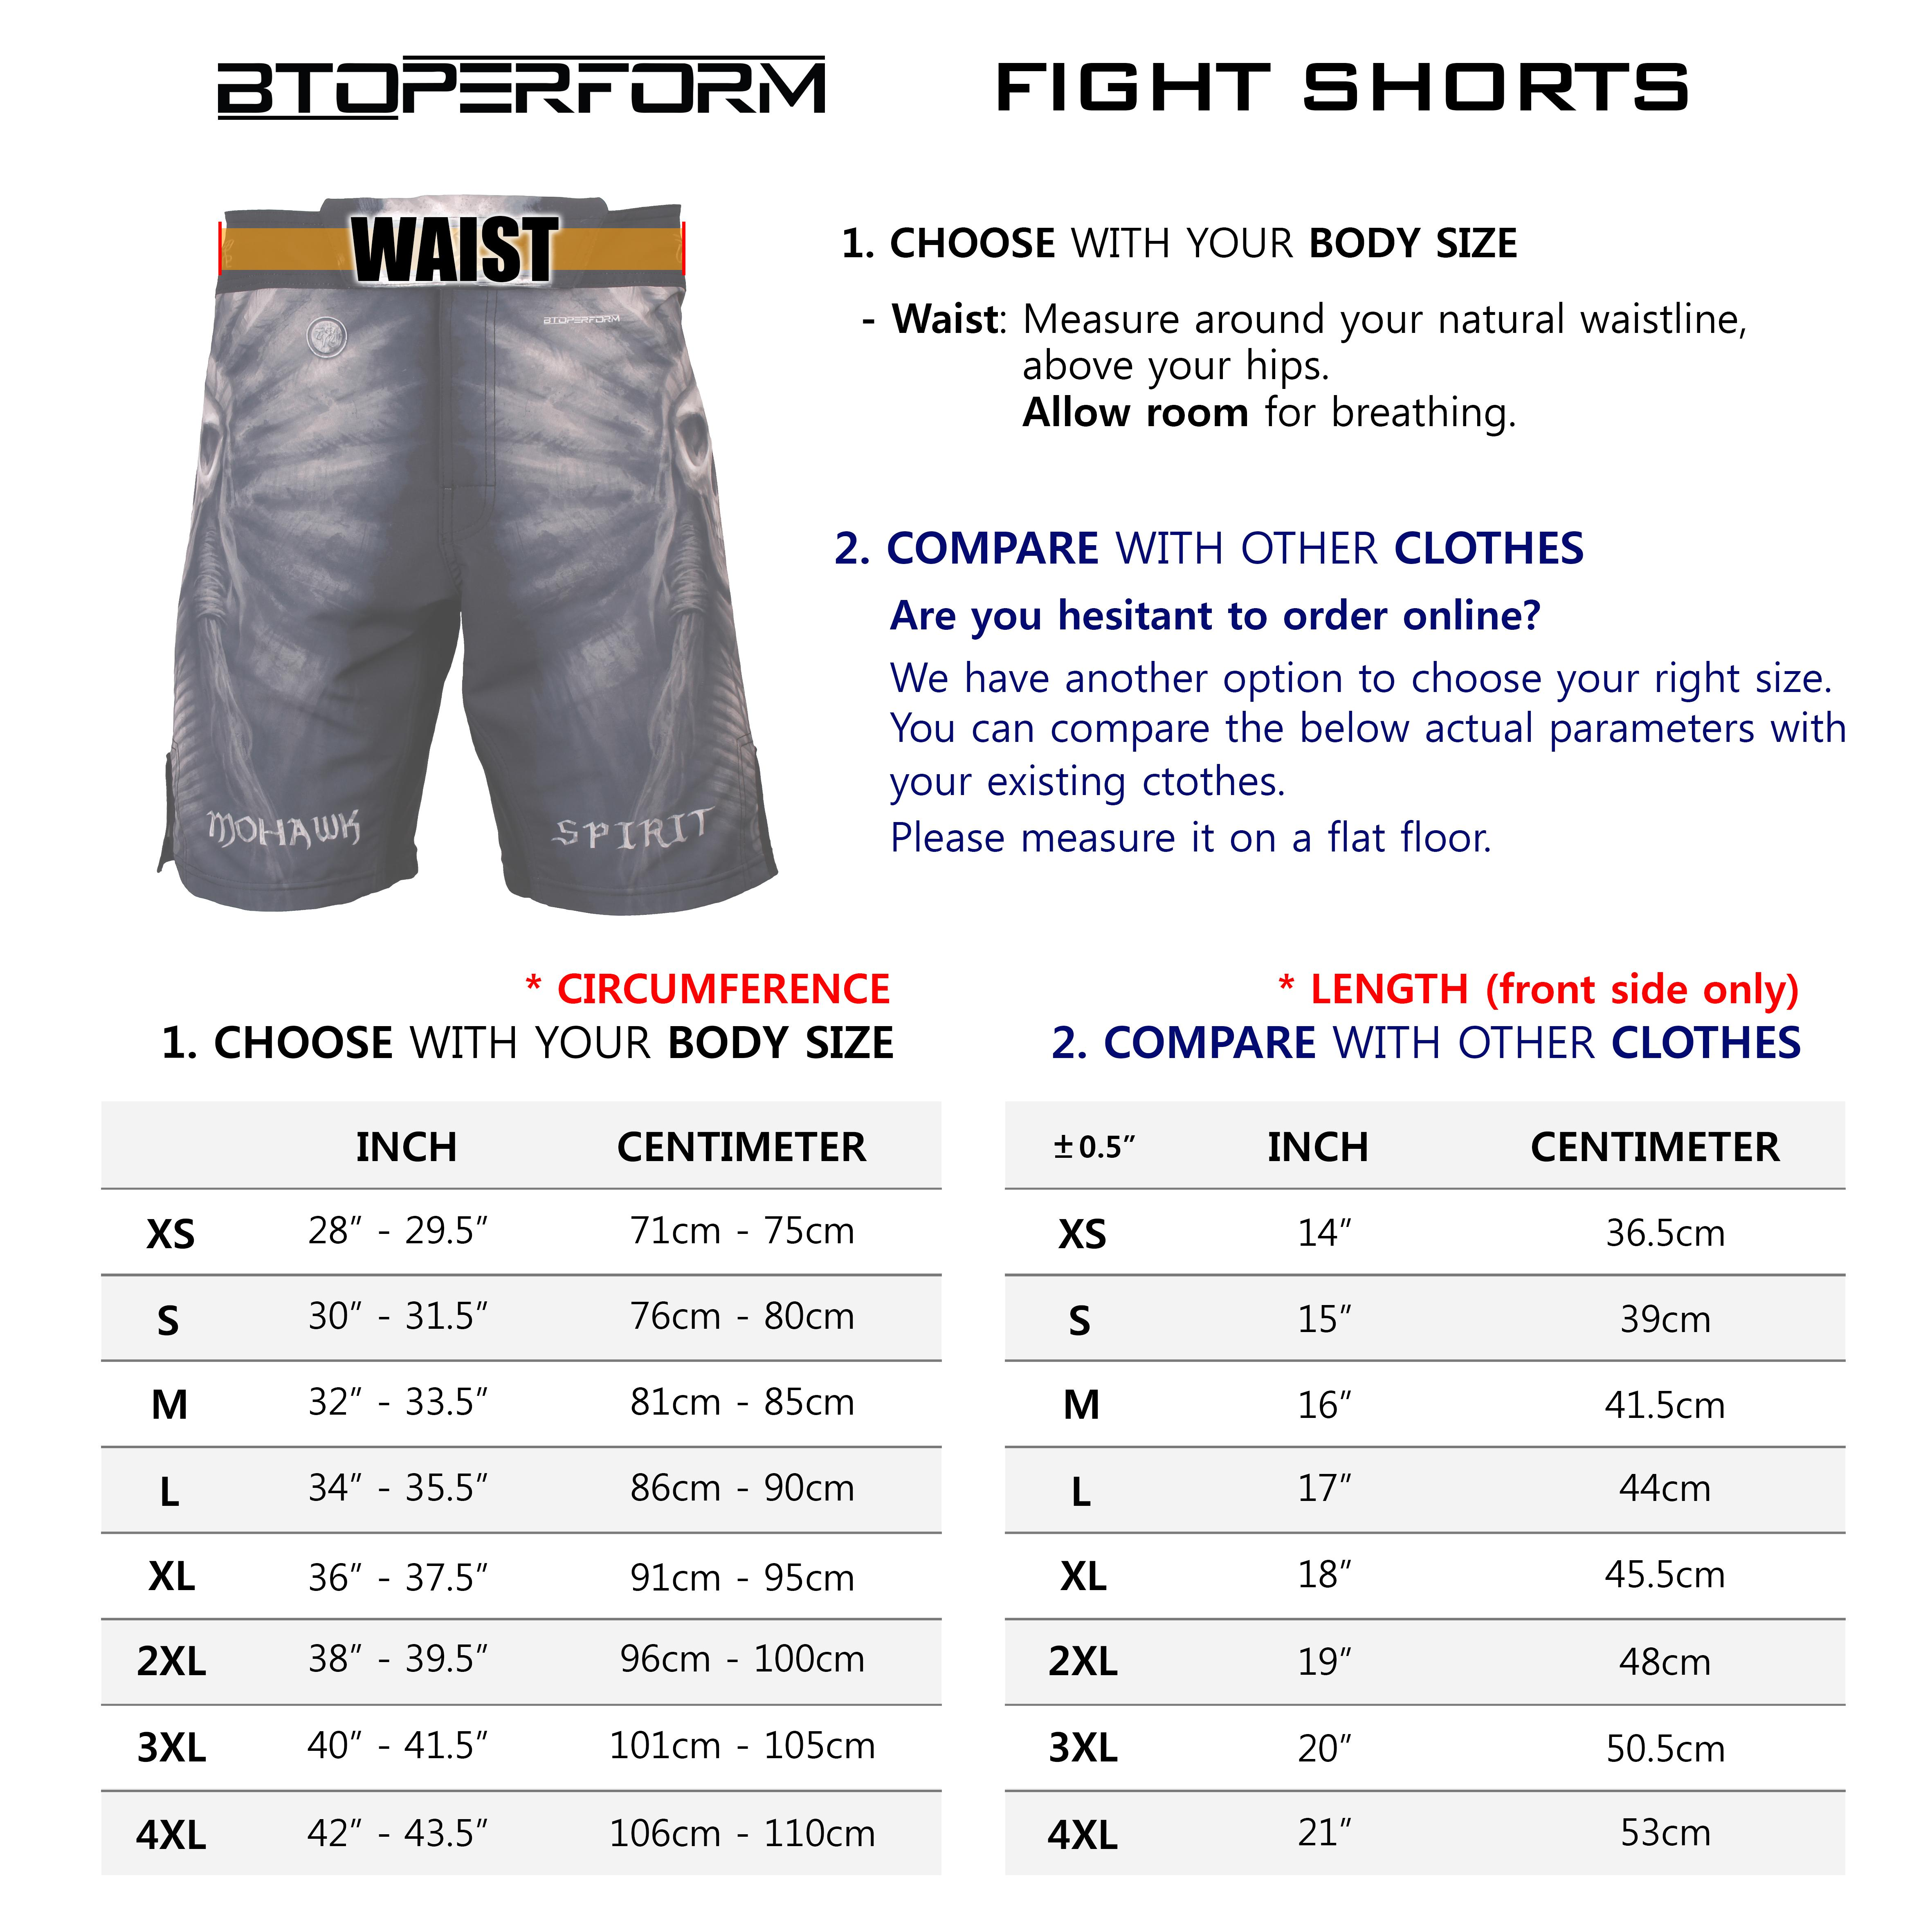 Btoperform Fight Shorts Sizing Chart